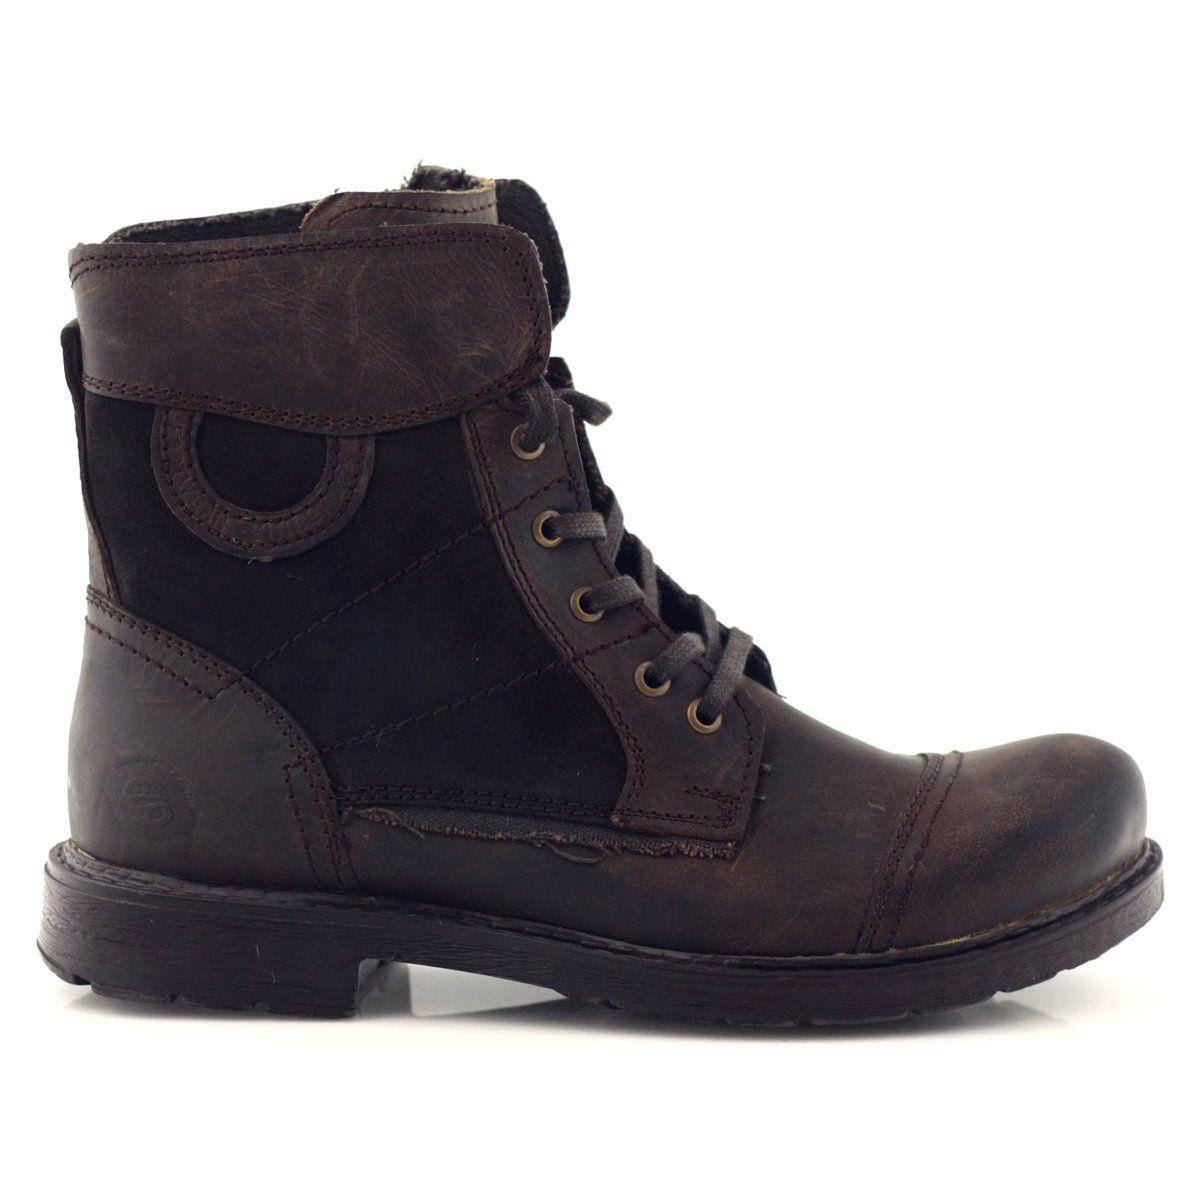 Trzewiki Trekkingowe Wysokie Dockers 270020 Brazowe Wielokolorowe Sneakers Wedge Sneaker Top Sneakers